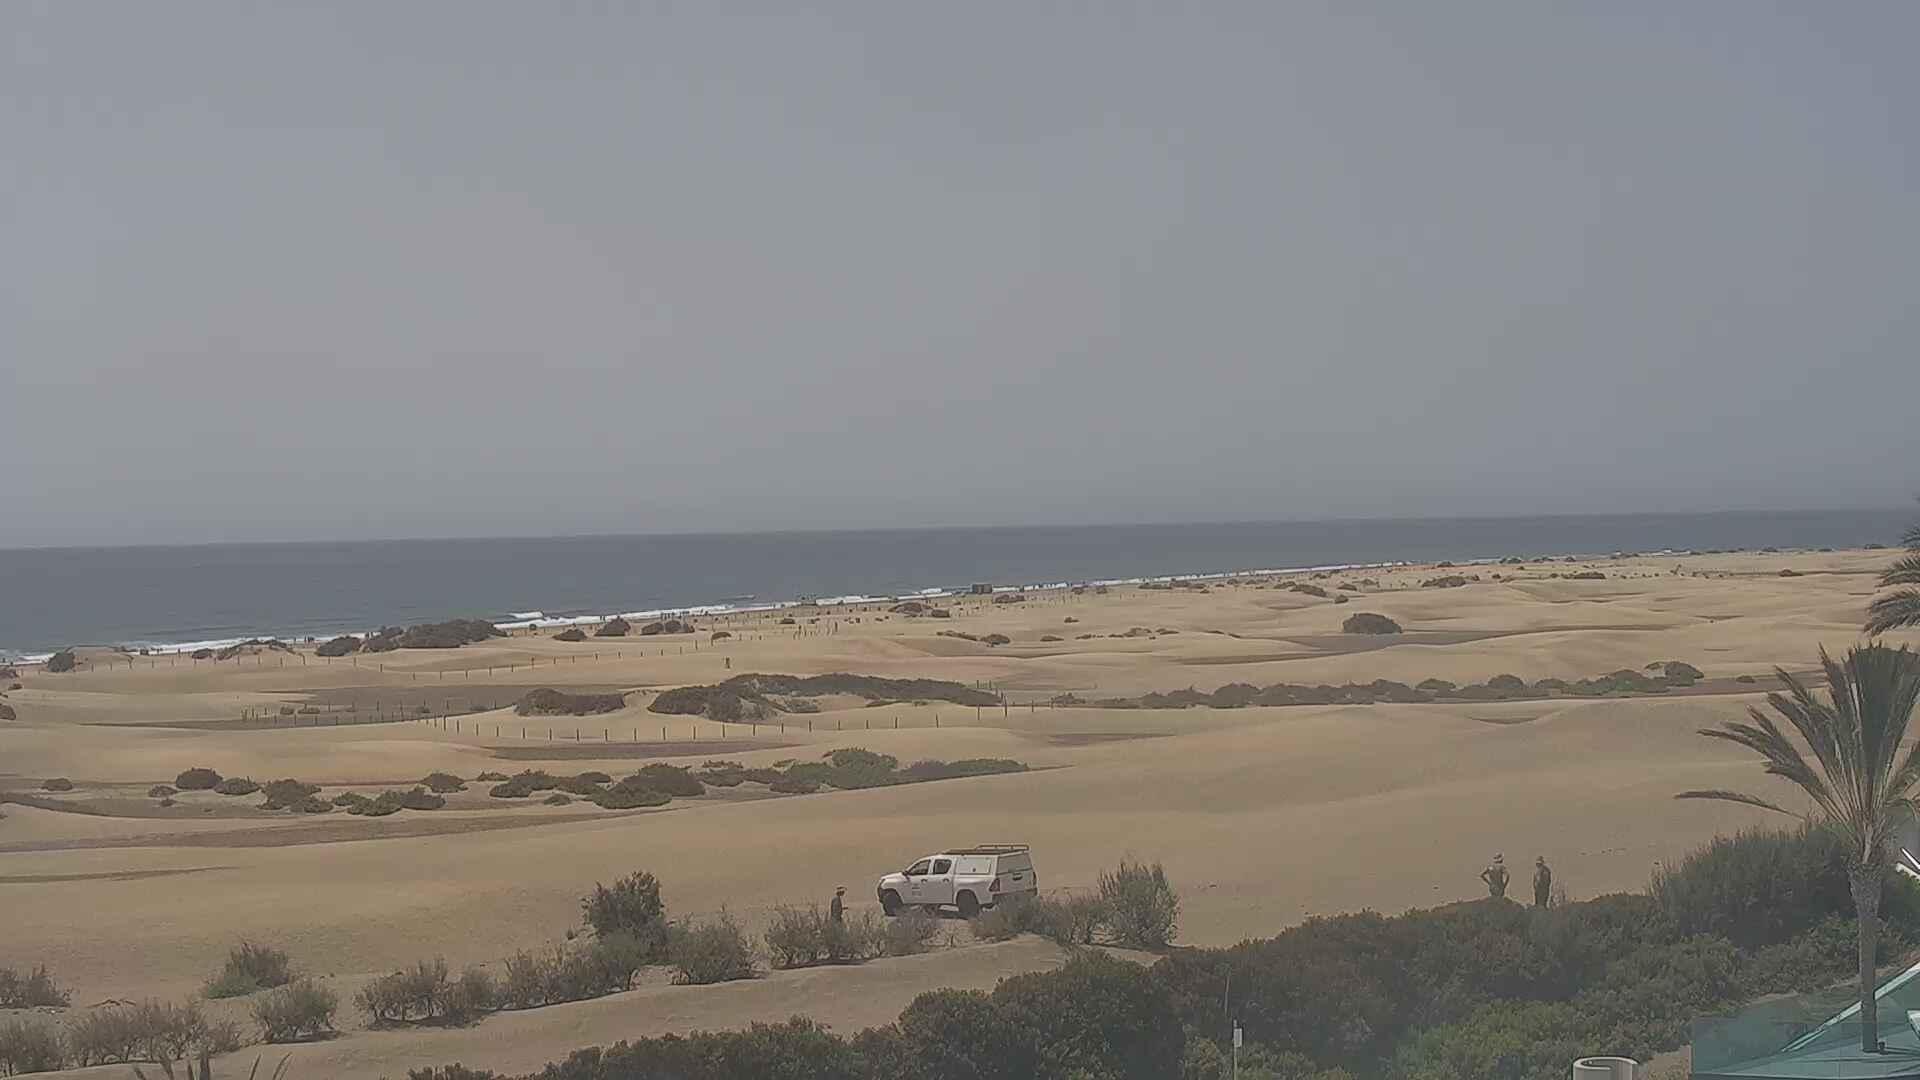 Playa del Ingles (Gran Canaria) Sat. 12:36